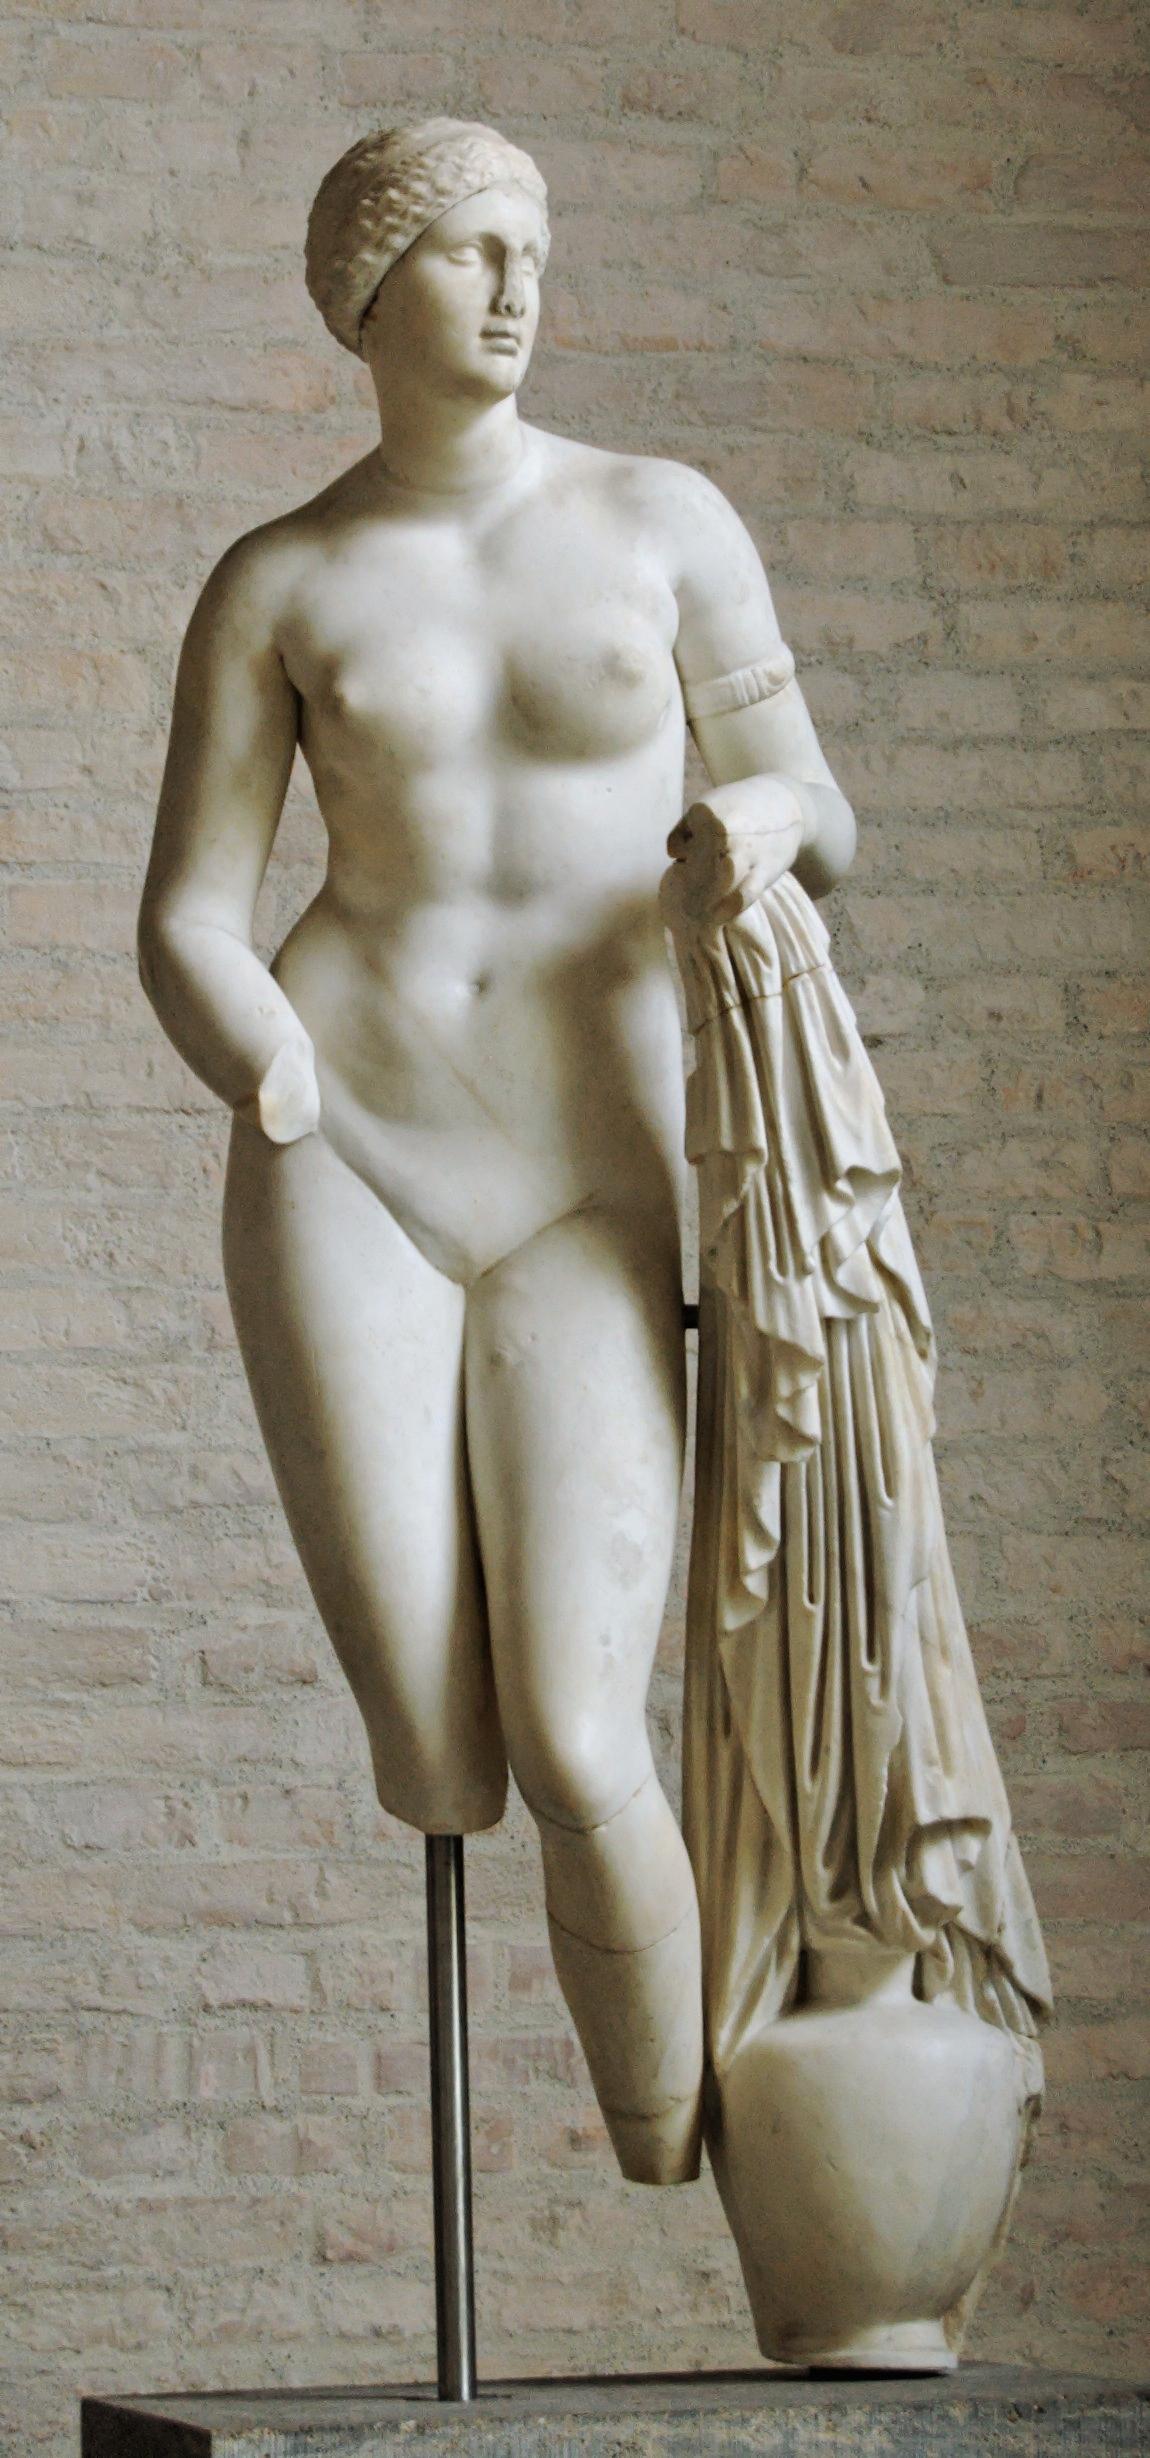 http://academic.ru/pictures/wiki/files/65/Aphrodite_Braschi_Glyptothek_Munich_258.jpg